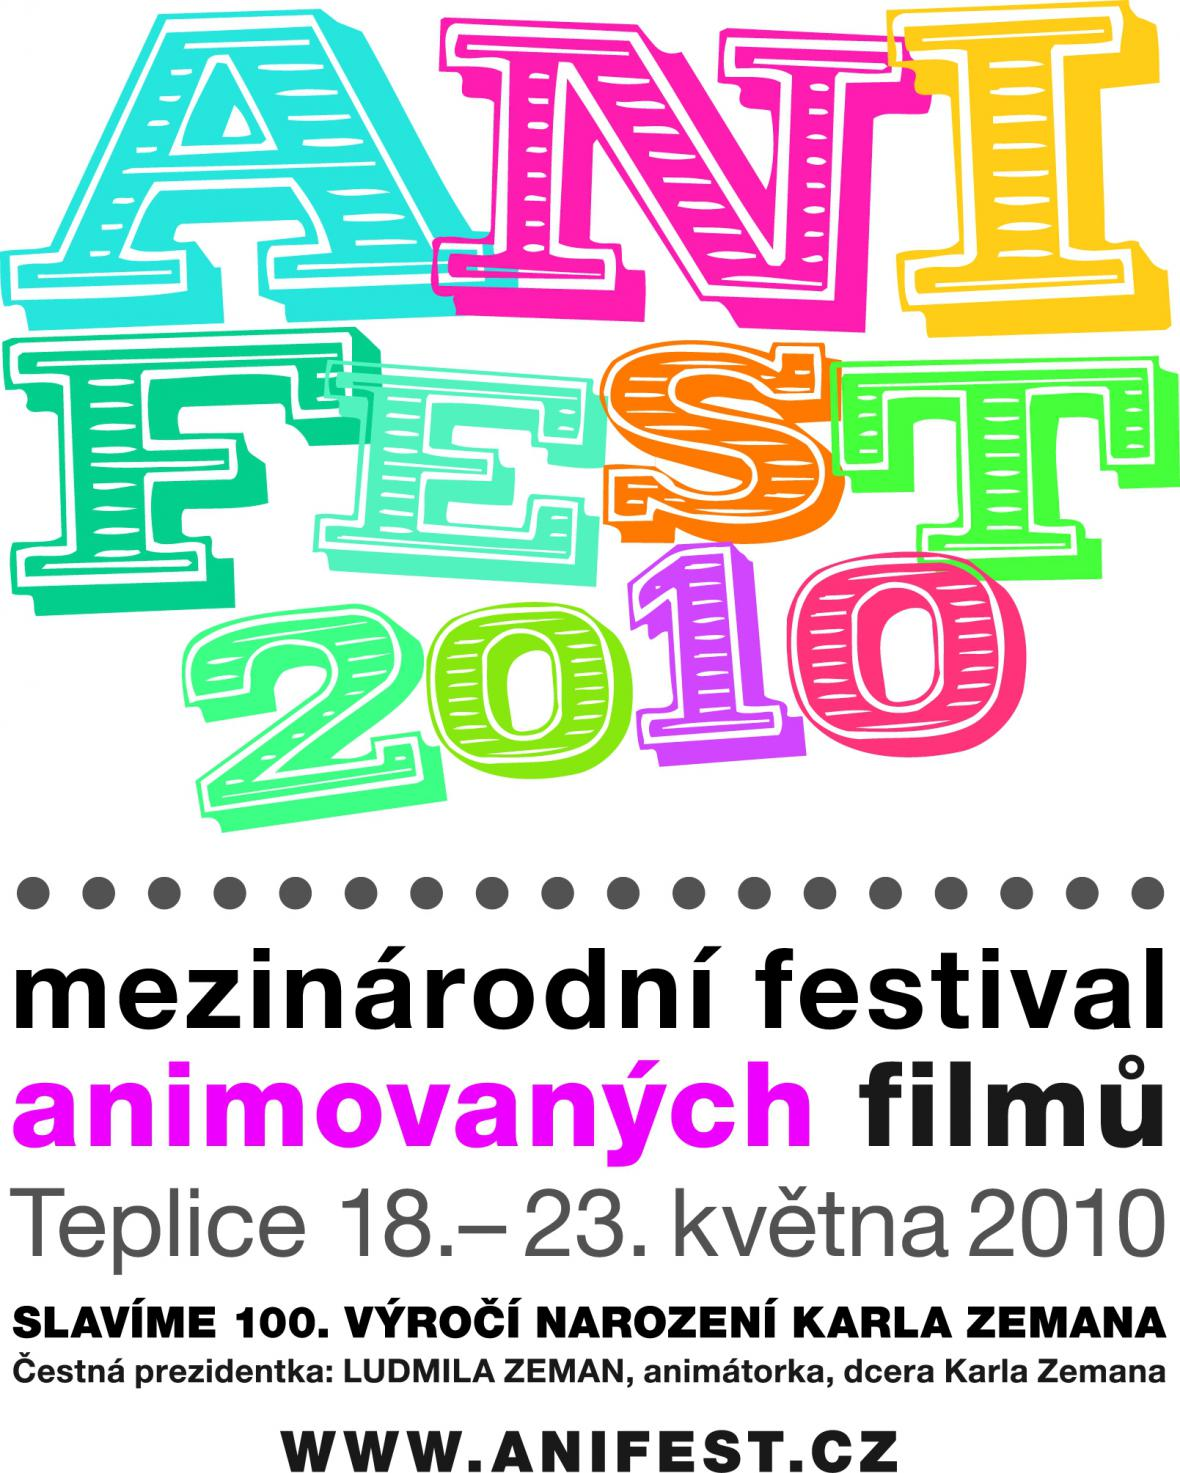 AniFest 2010